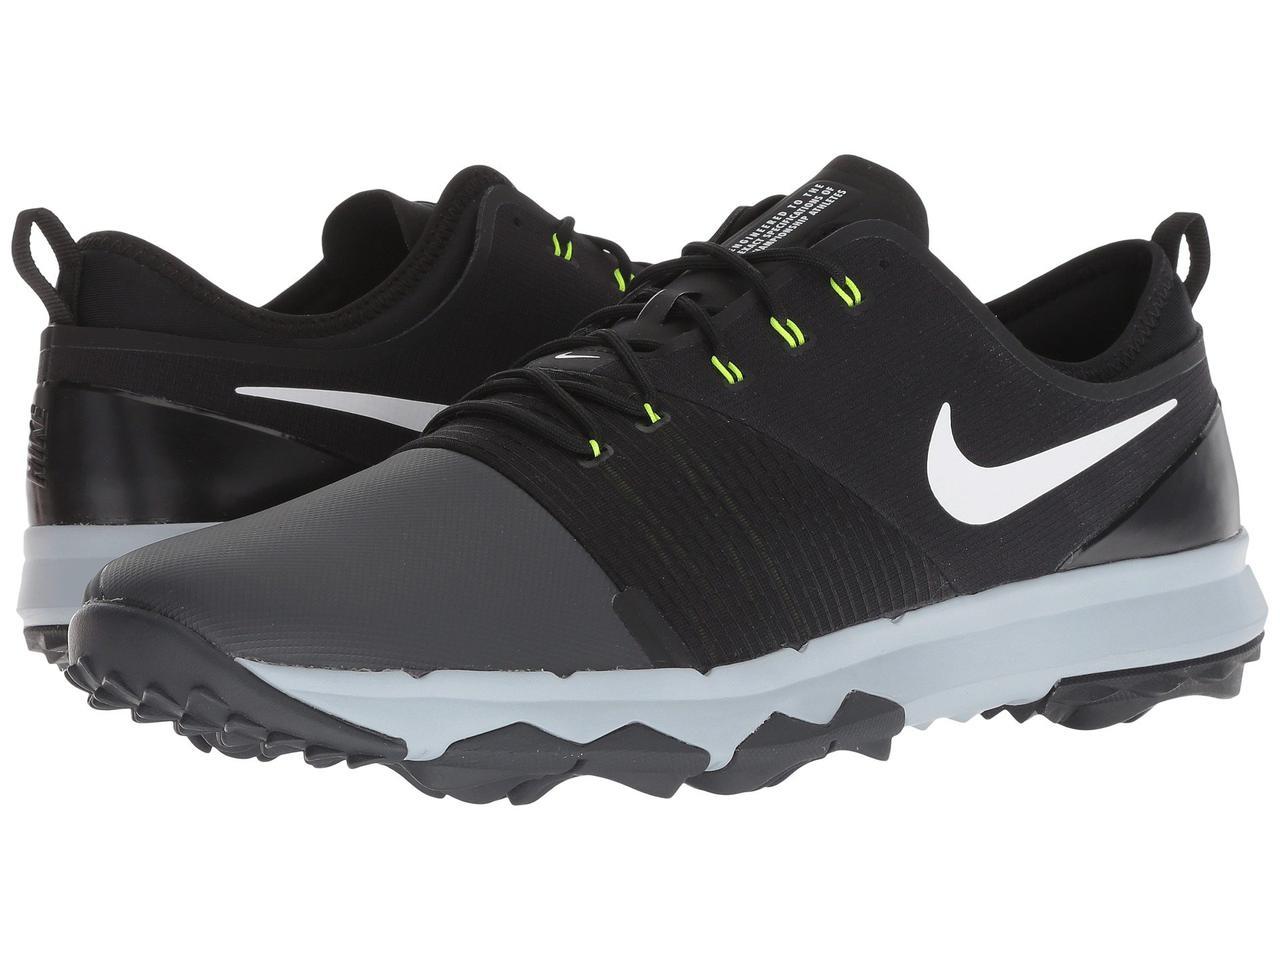 Кроссовки Кеды (Оригинал) Nike Golf FI Impact 3 Anthracite White Black a7f473e15b1